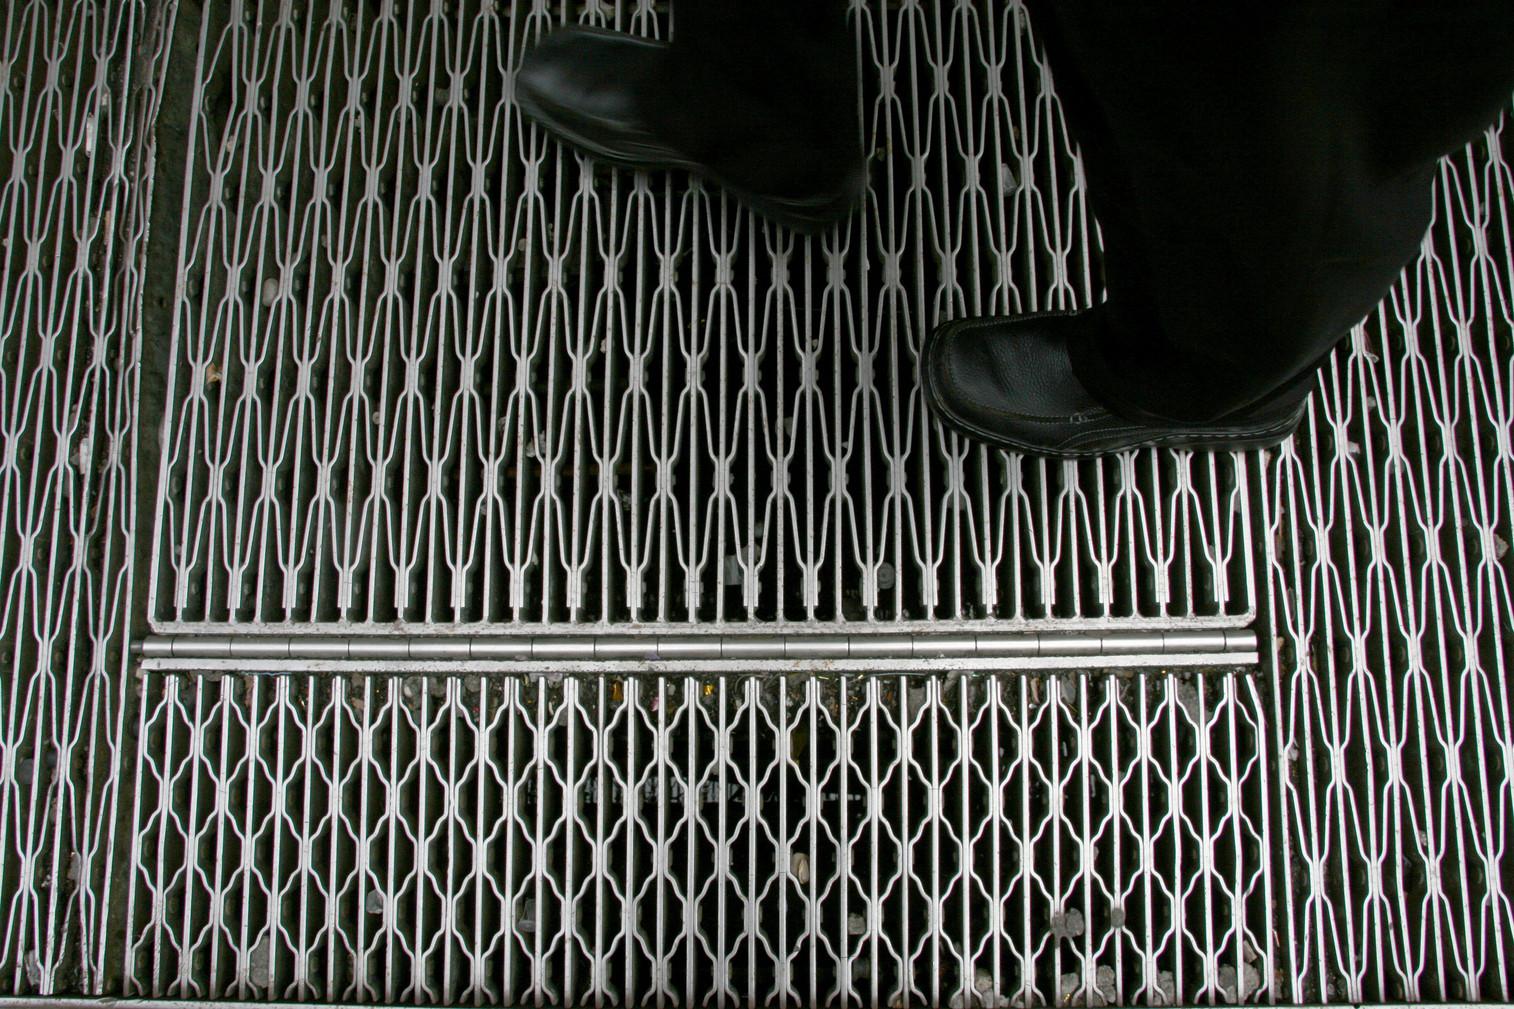 06_New York Polyphony, 2008, Fotografie,